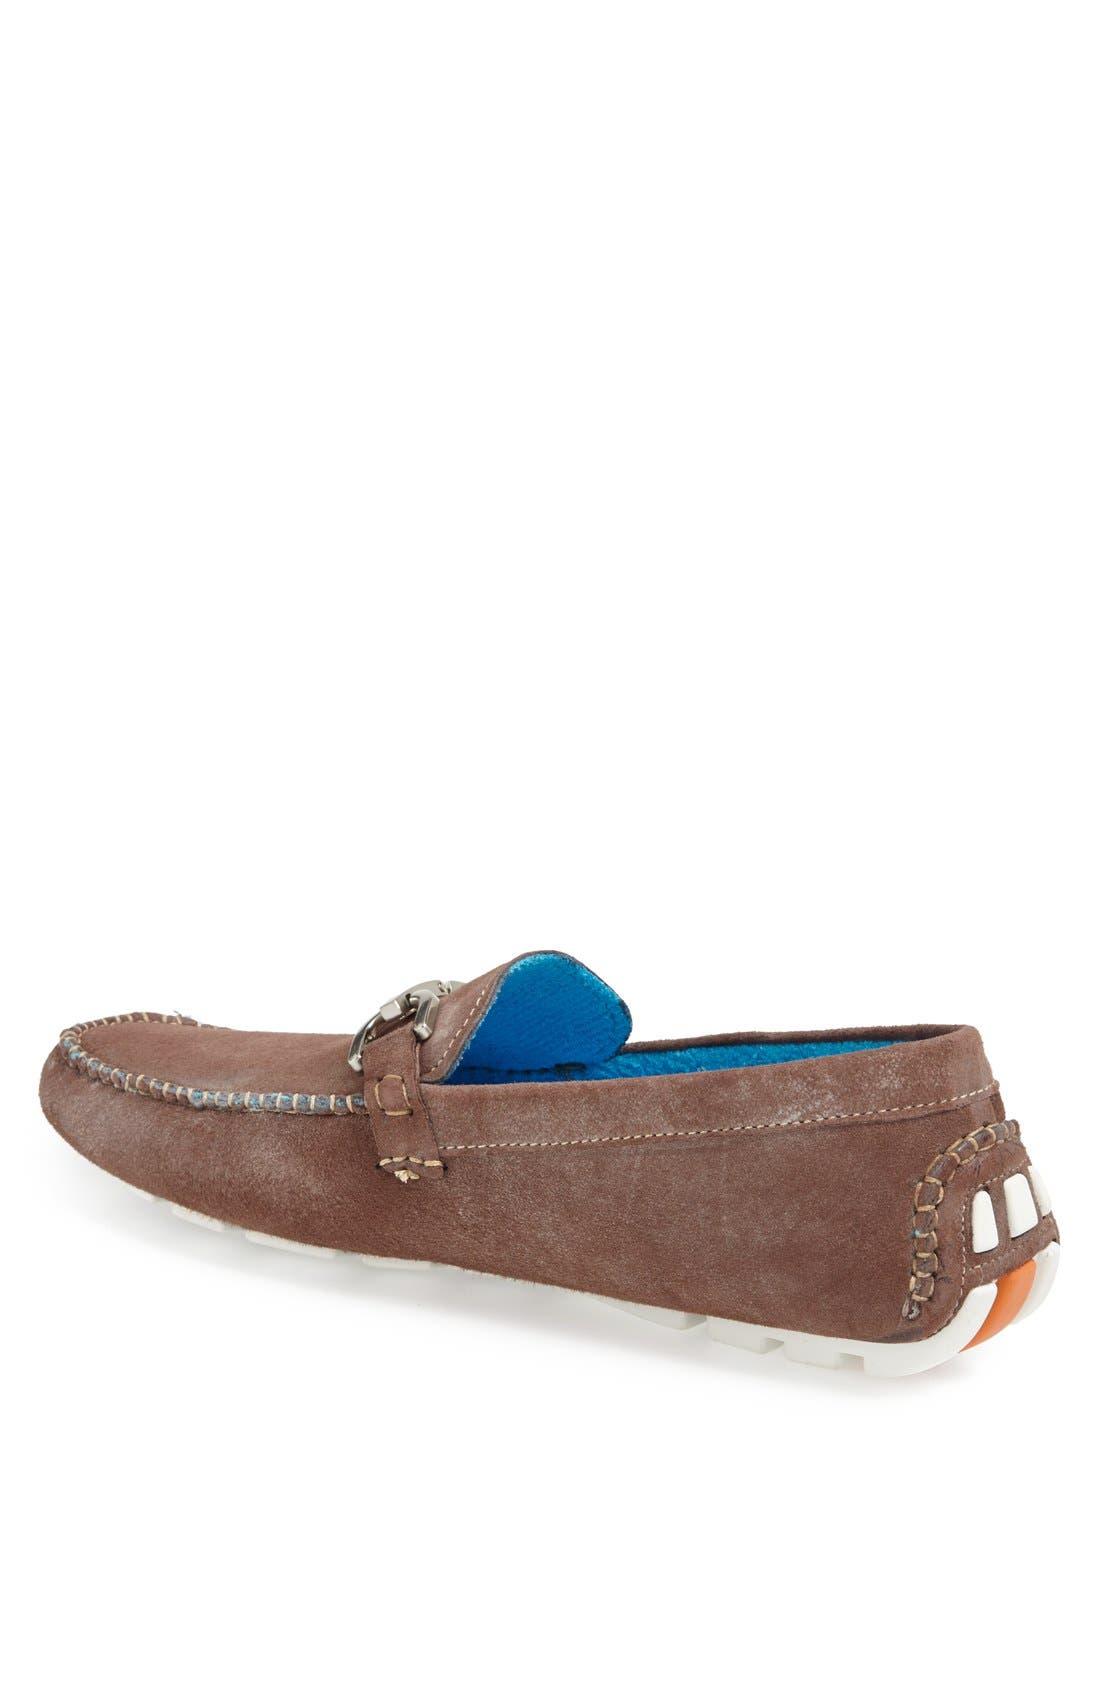 Alternate Image 2  - Donald J Pliner 'Veeda' Driving Shoe